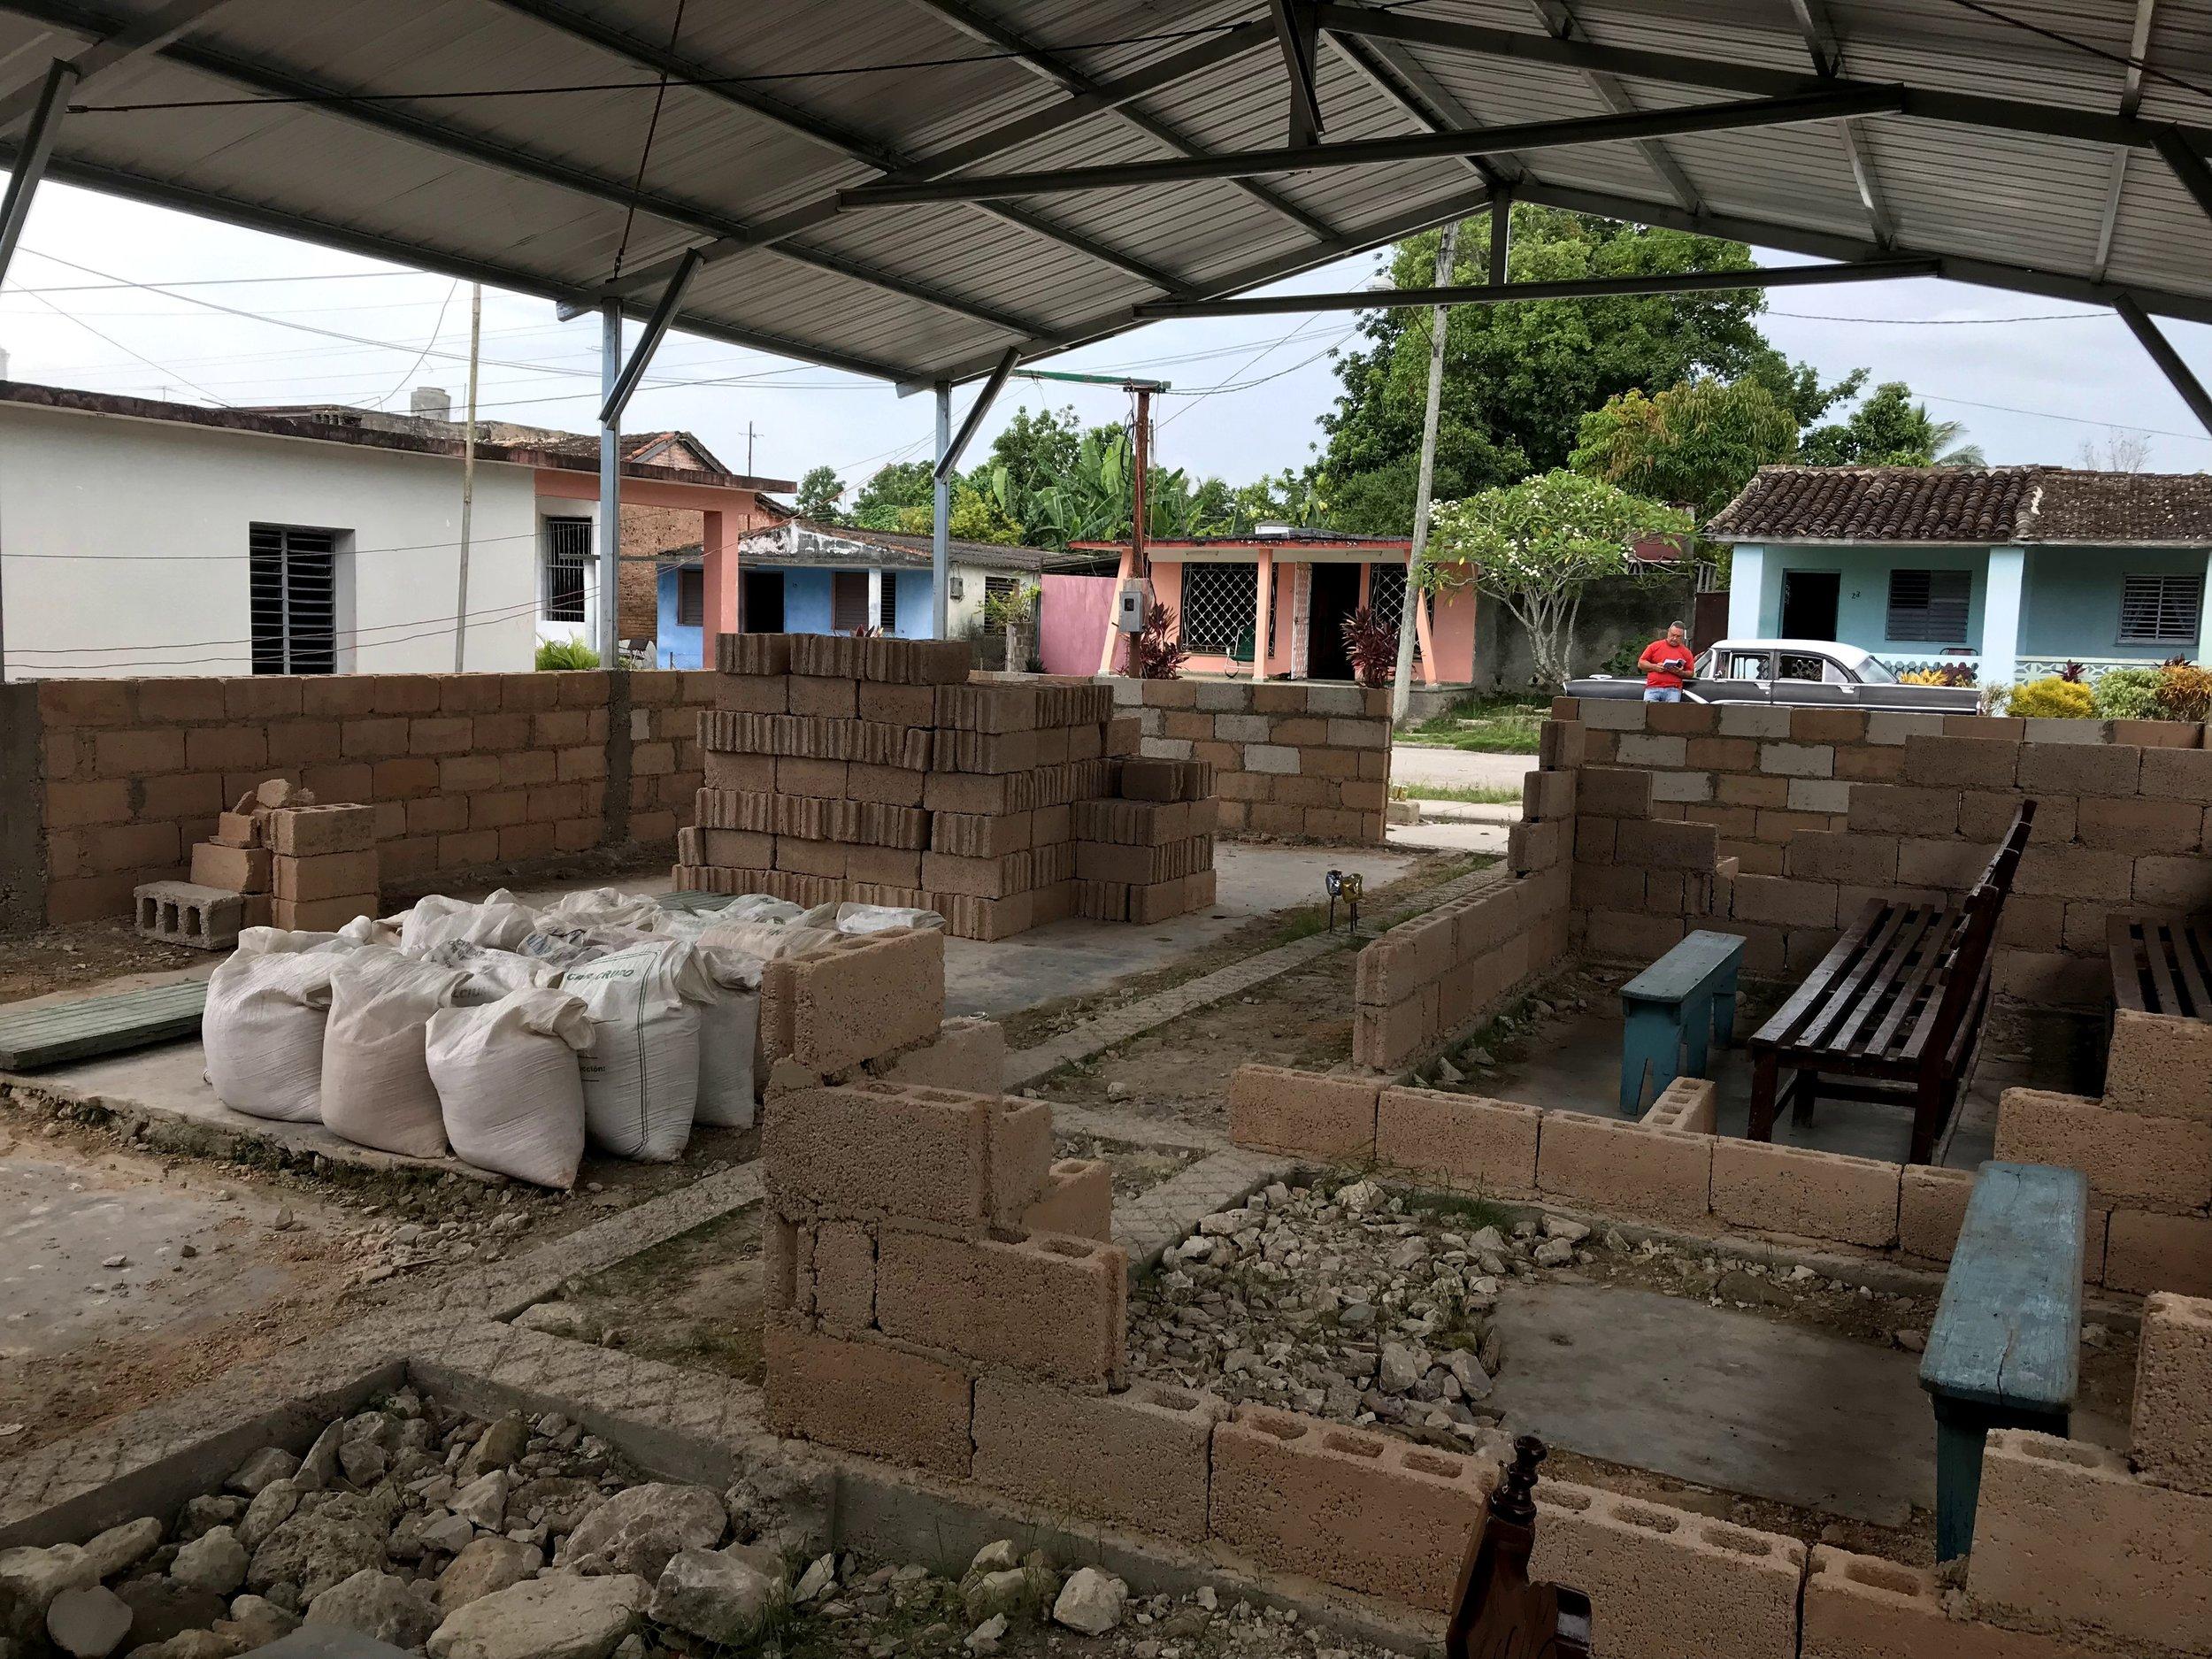 New Building Construction is Underway